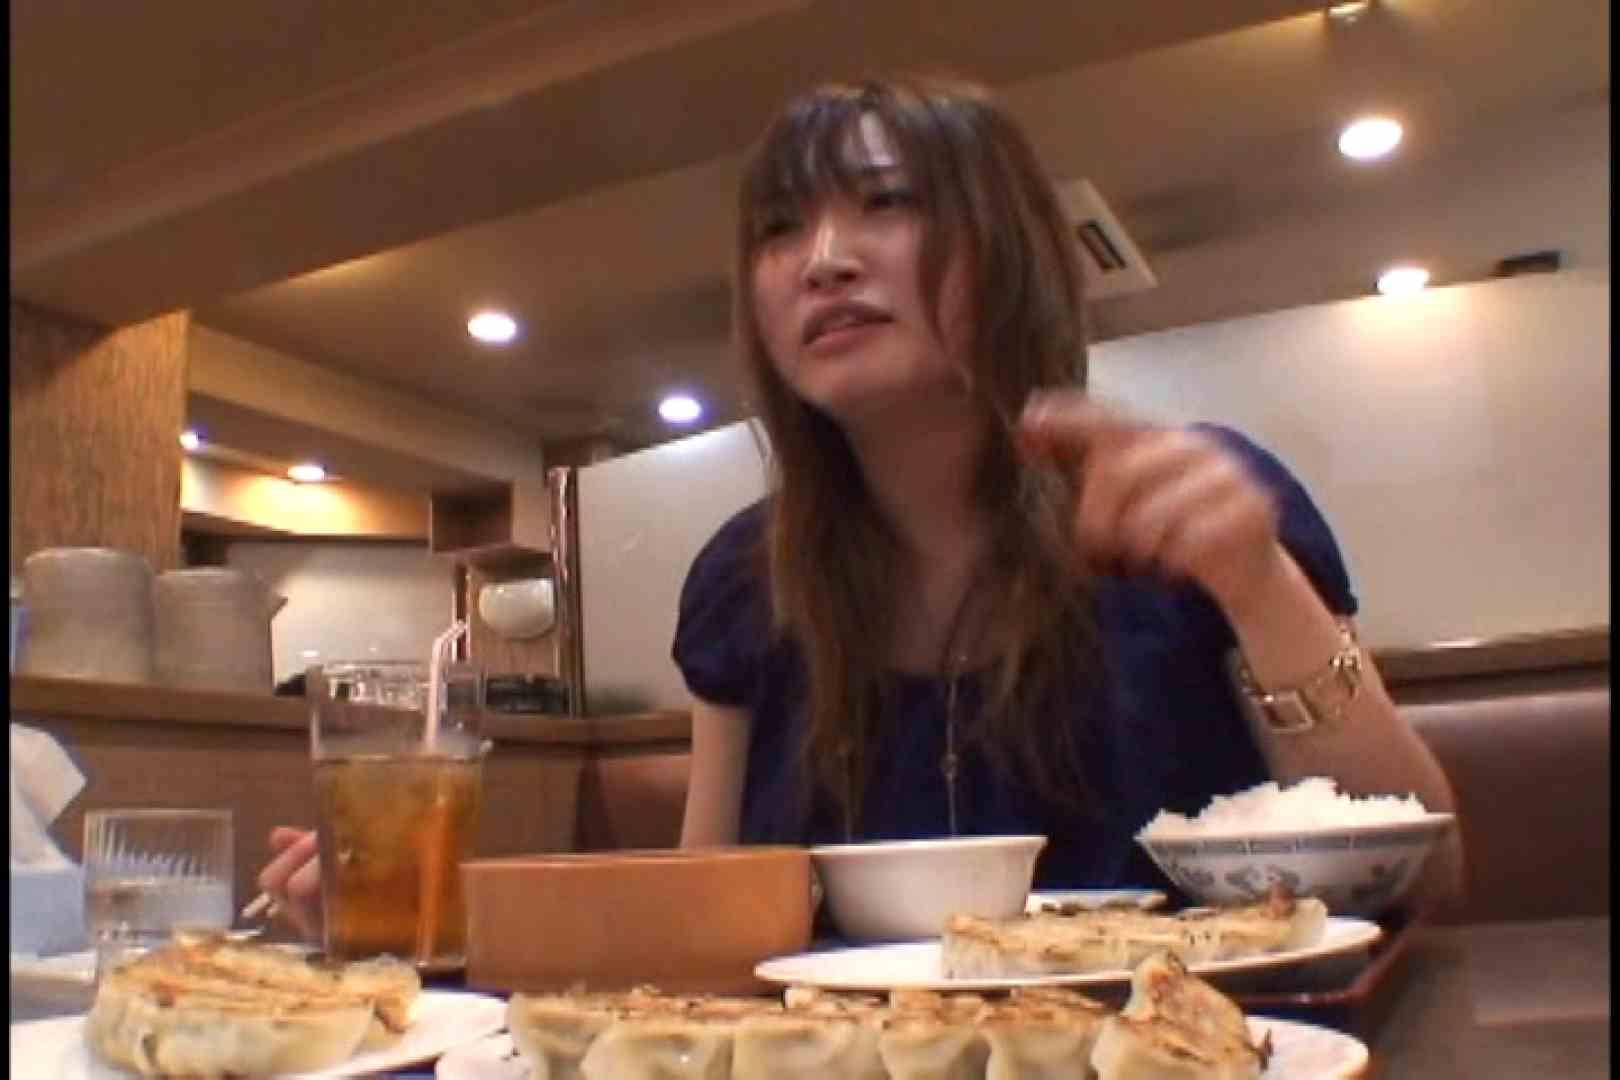 JDハンター全国ツアー vol.005 後編 女子大生のエロ動画 | 0  96PIX 3